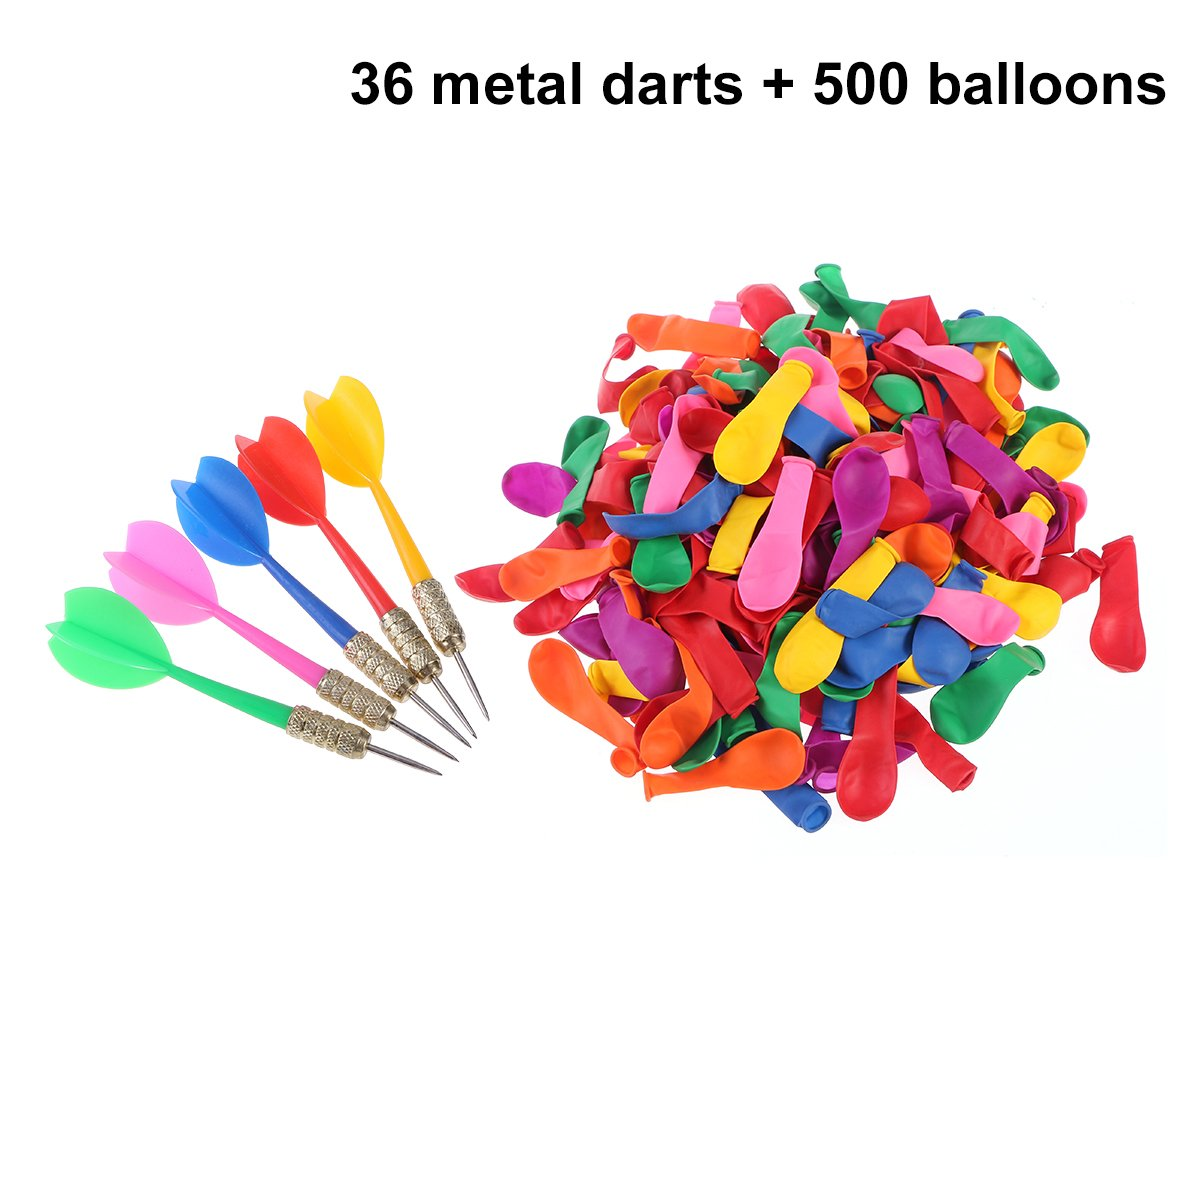 TOYMYTOY Darts Target Game Set 36pcs Darts 500pcs Balloons Bundle Party Carnival Balloon Pop Game